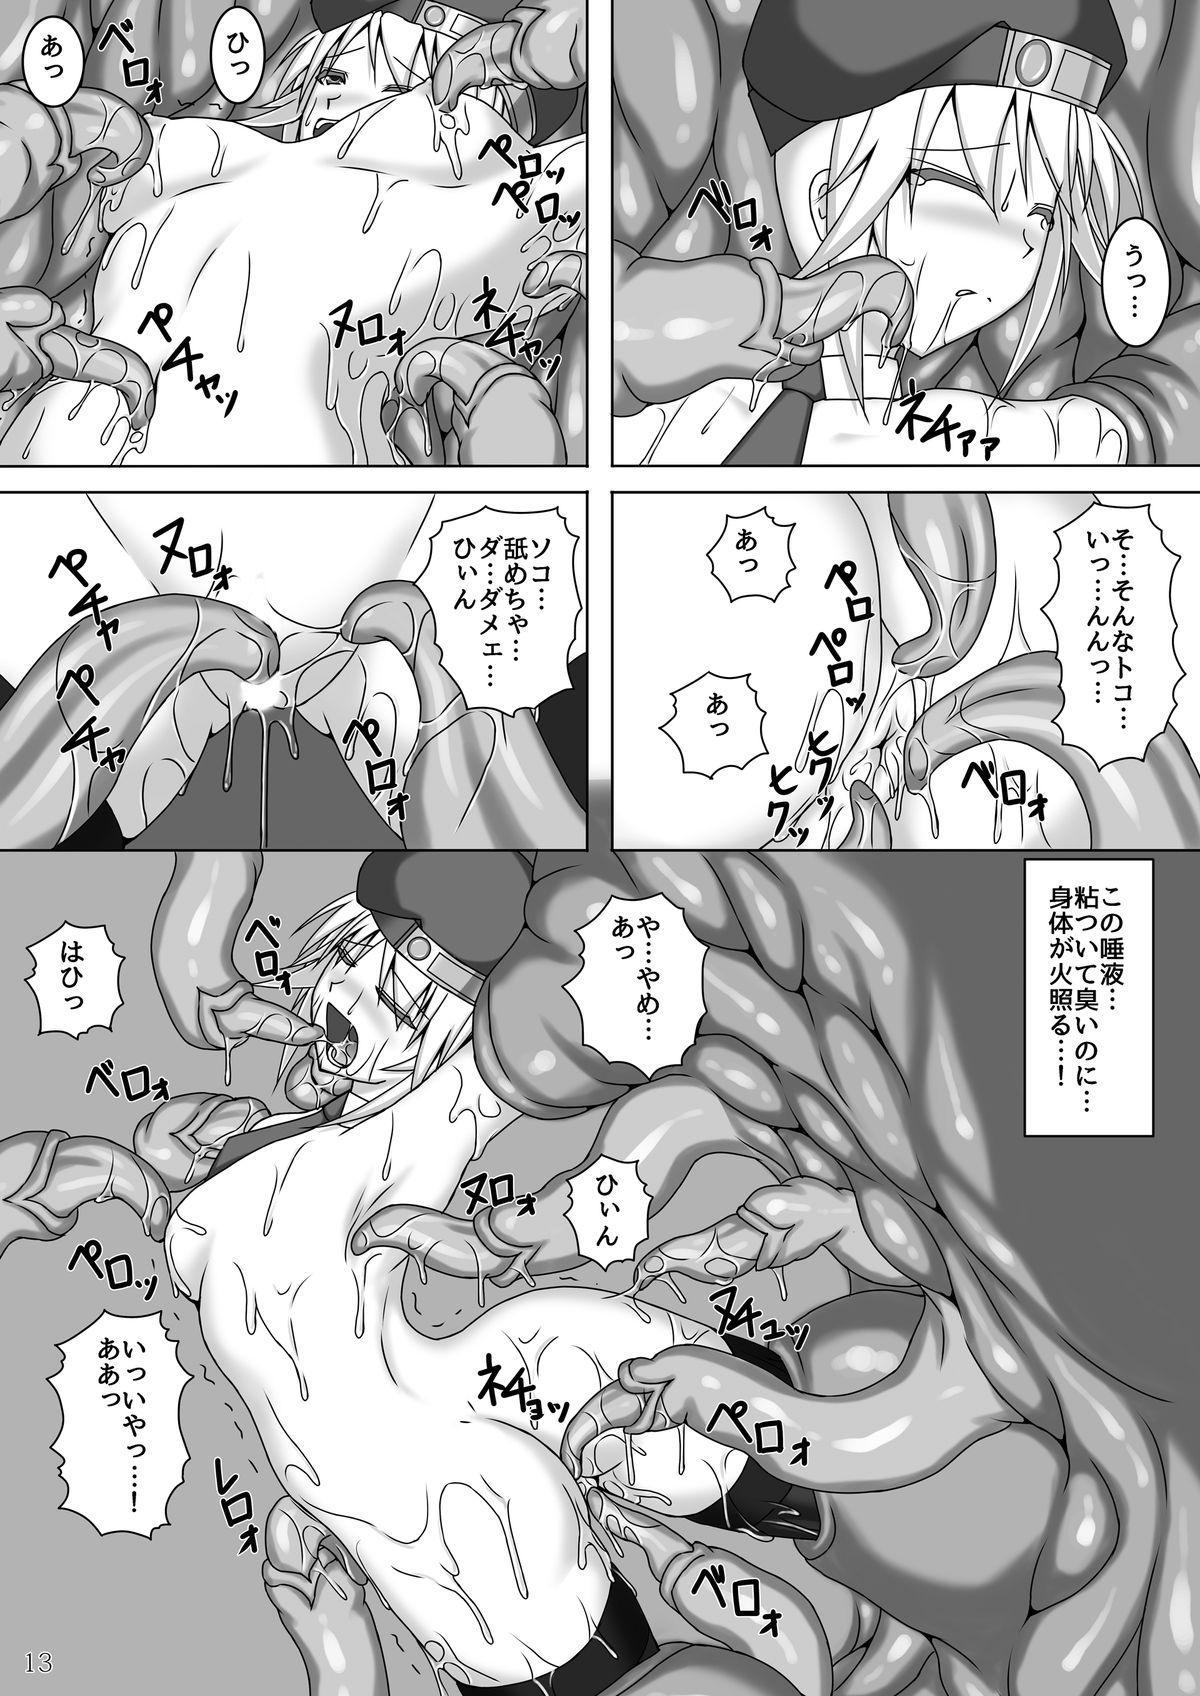 Arakune ga Kirai na Noel Nanka Imasen! 13